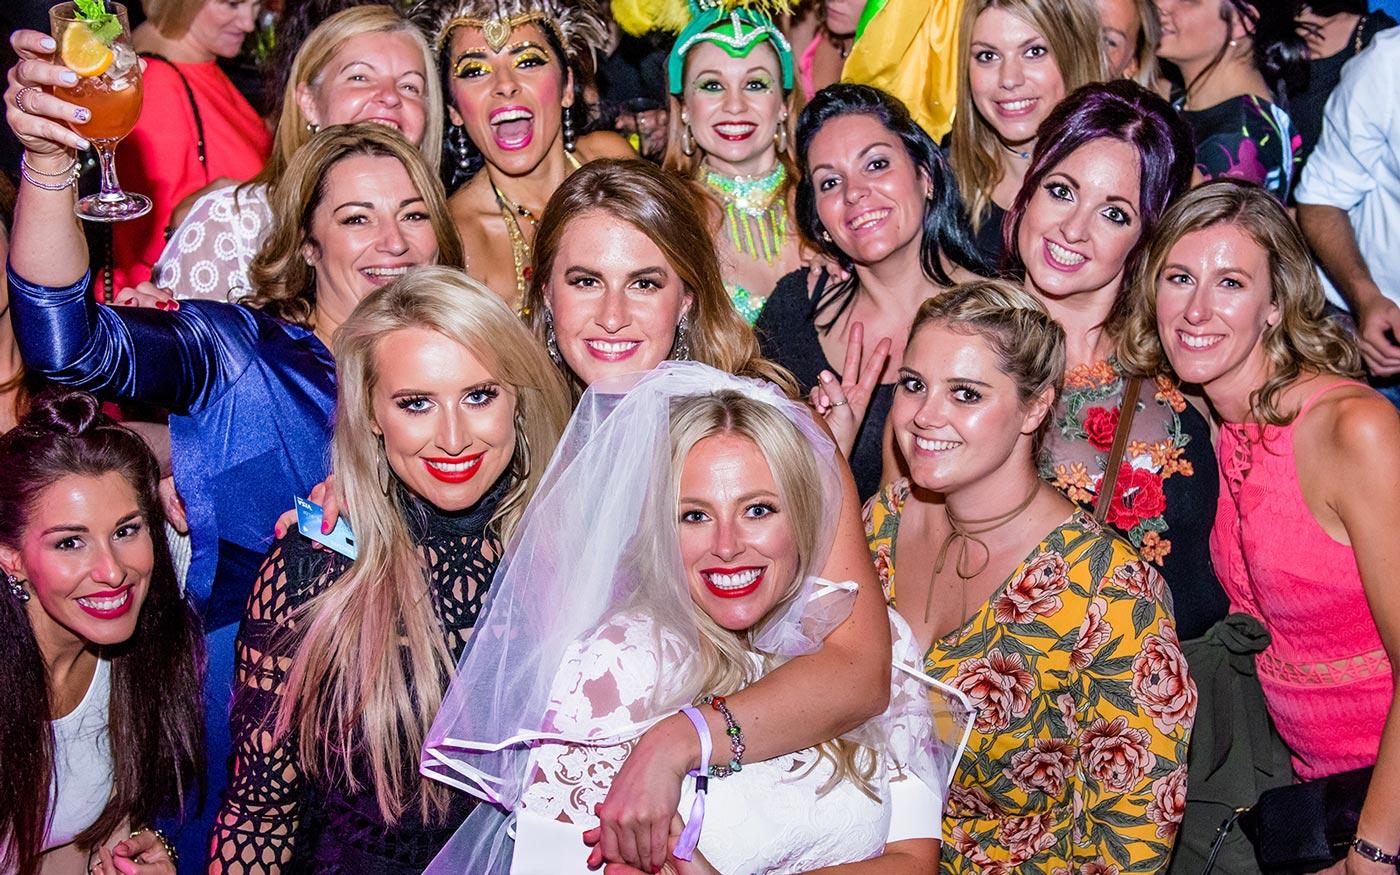 Girls last night of freedom - Hen party hotel